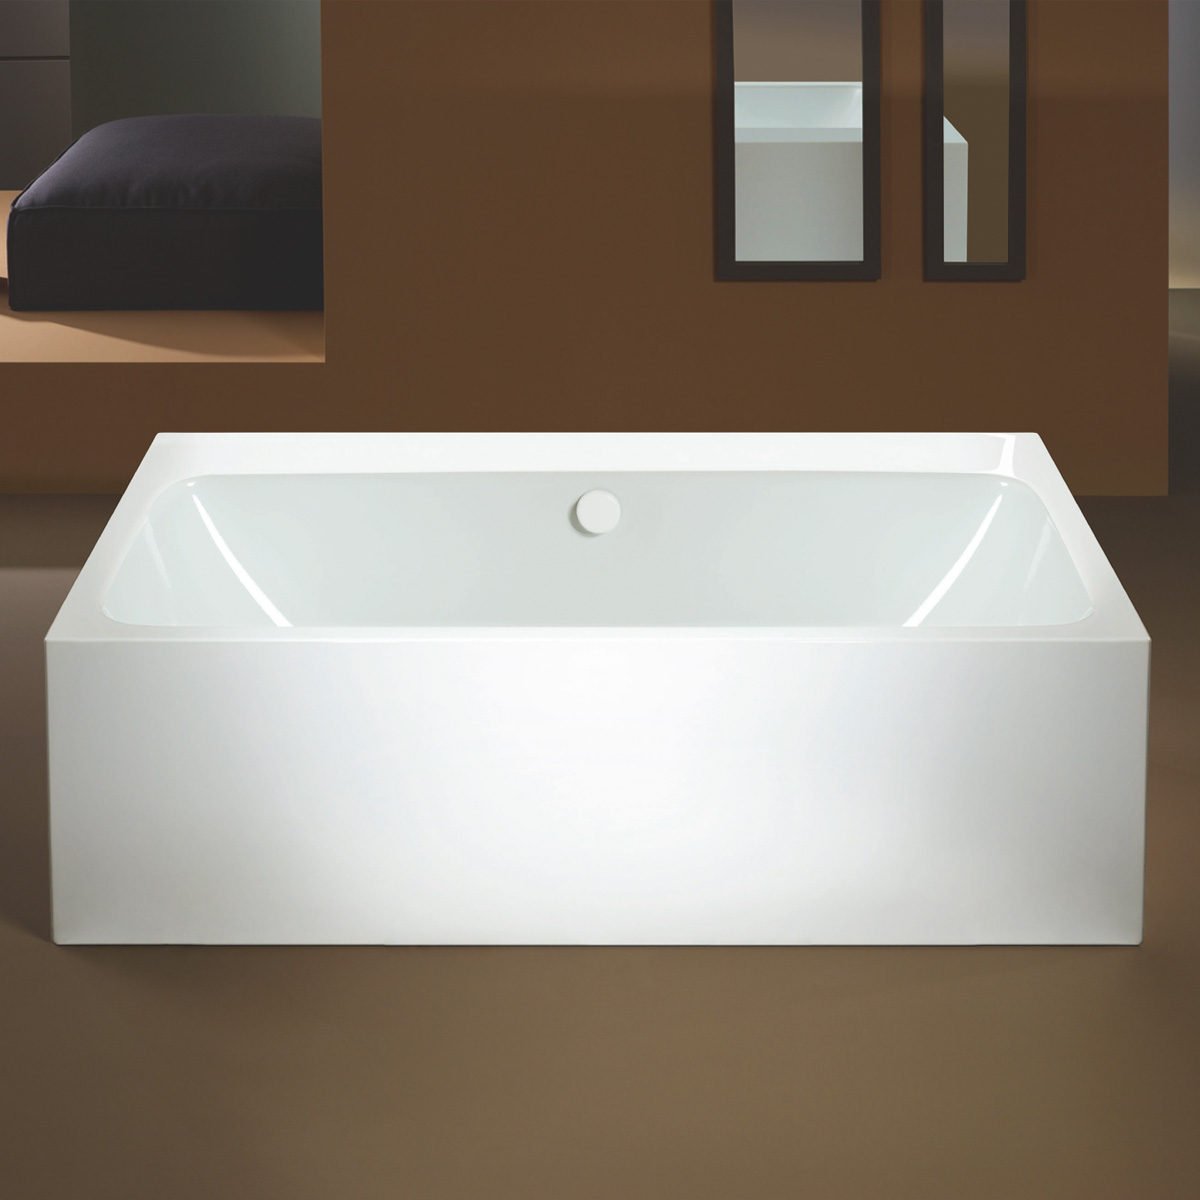 kaldewei meisterst ck asymmetric duo 1740 freistehende. Black Bedroom Furniture Sets. Home Design Ideas